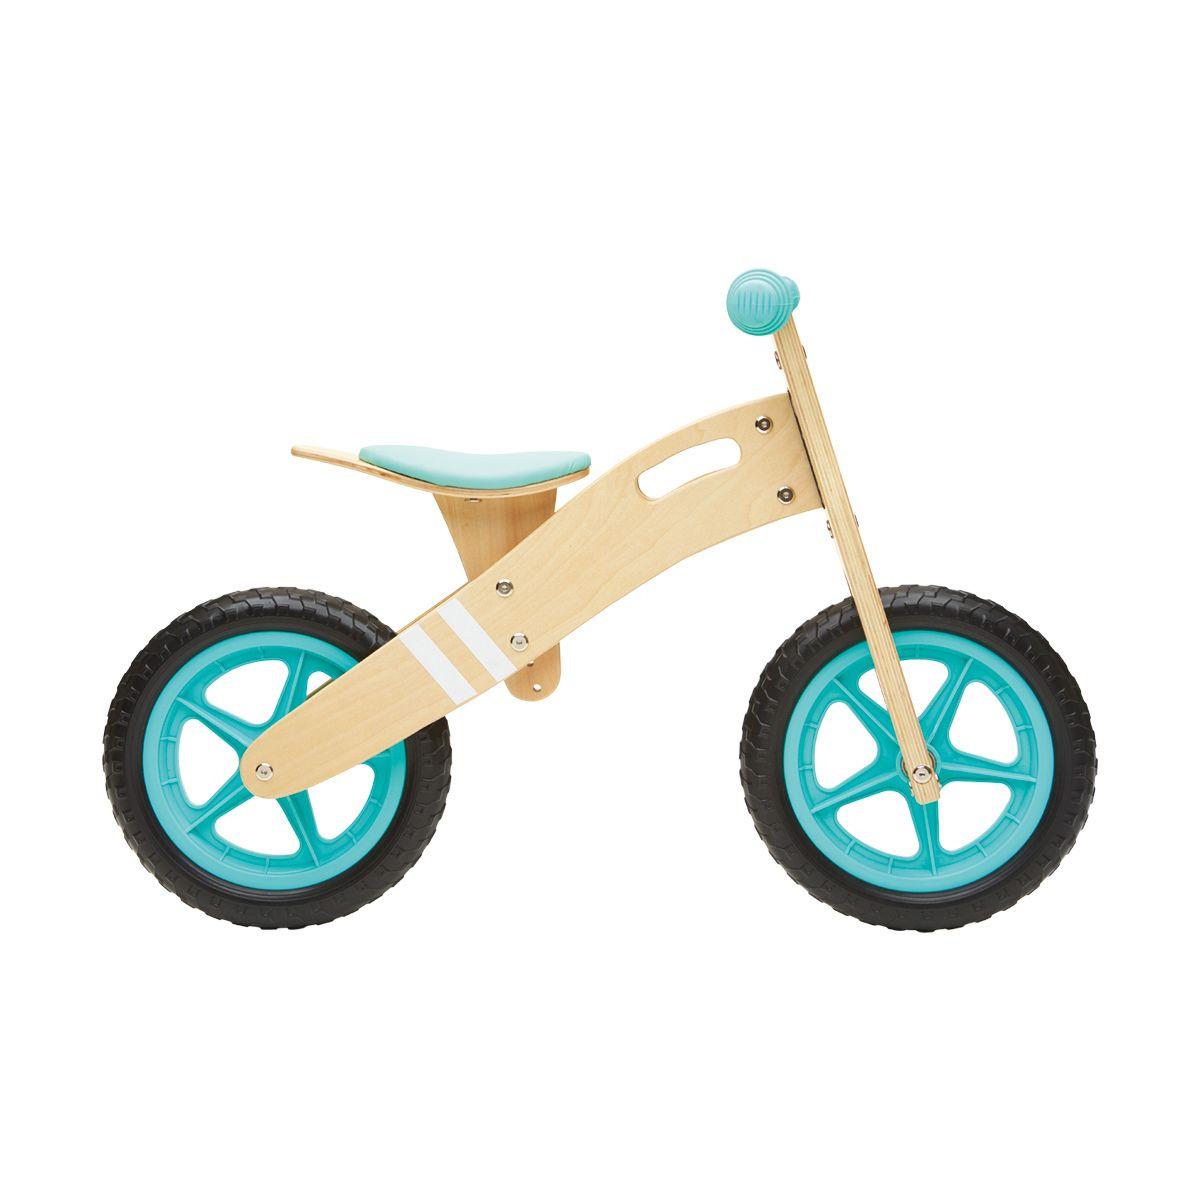 28cm Wooden Balance Bike Kmart Kids Mountain Bikes Outdoor